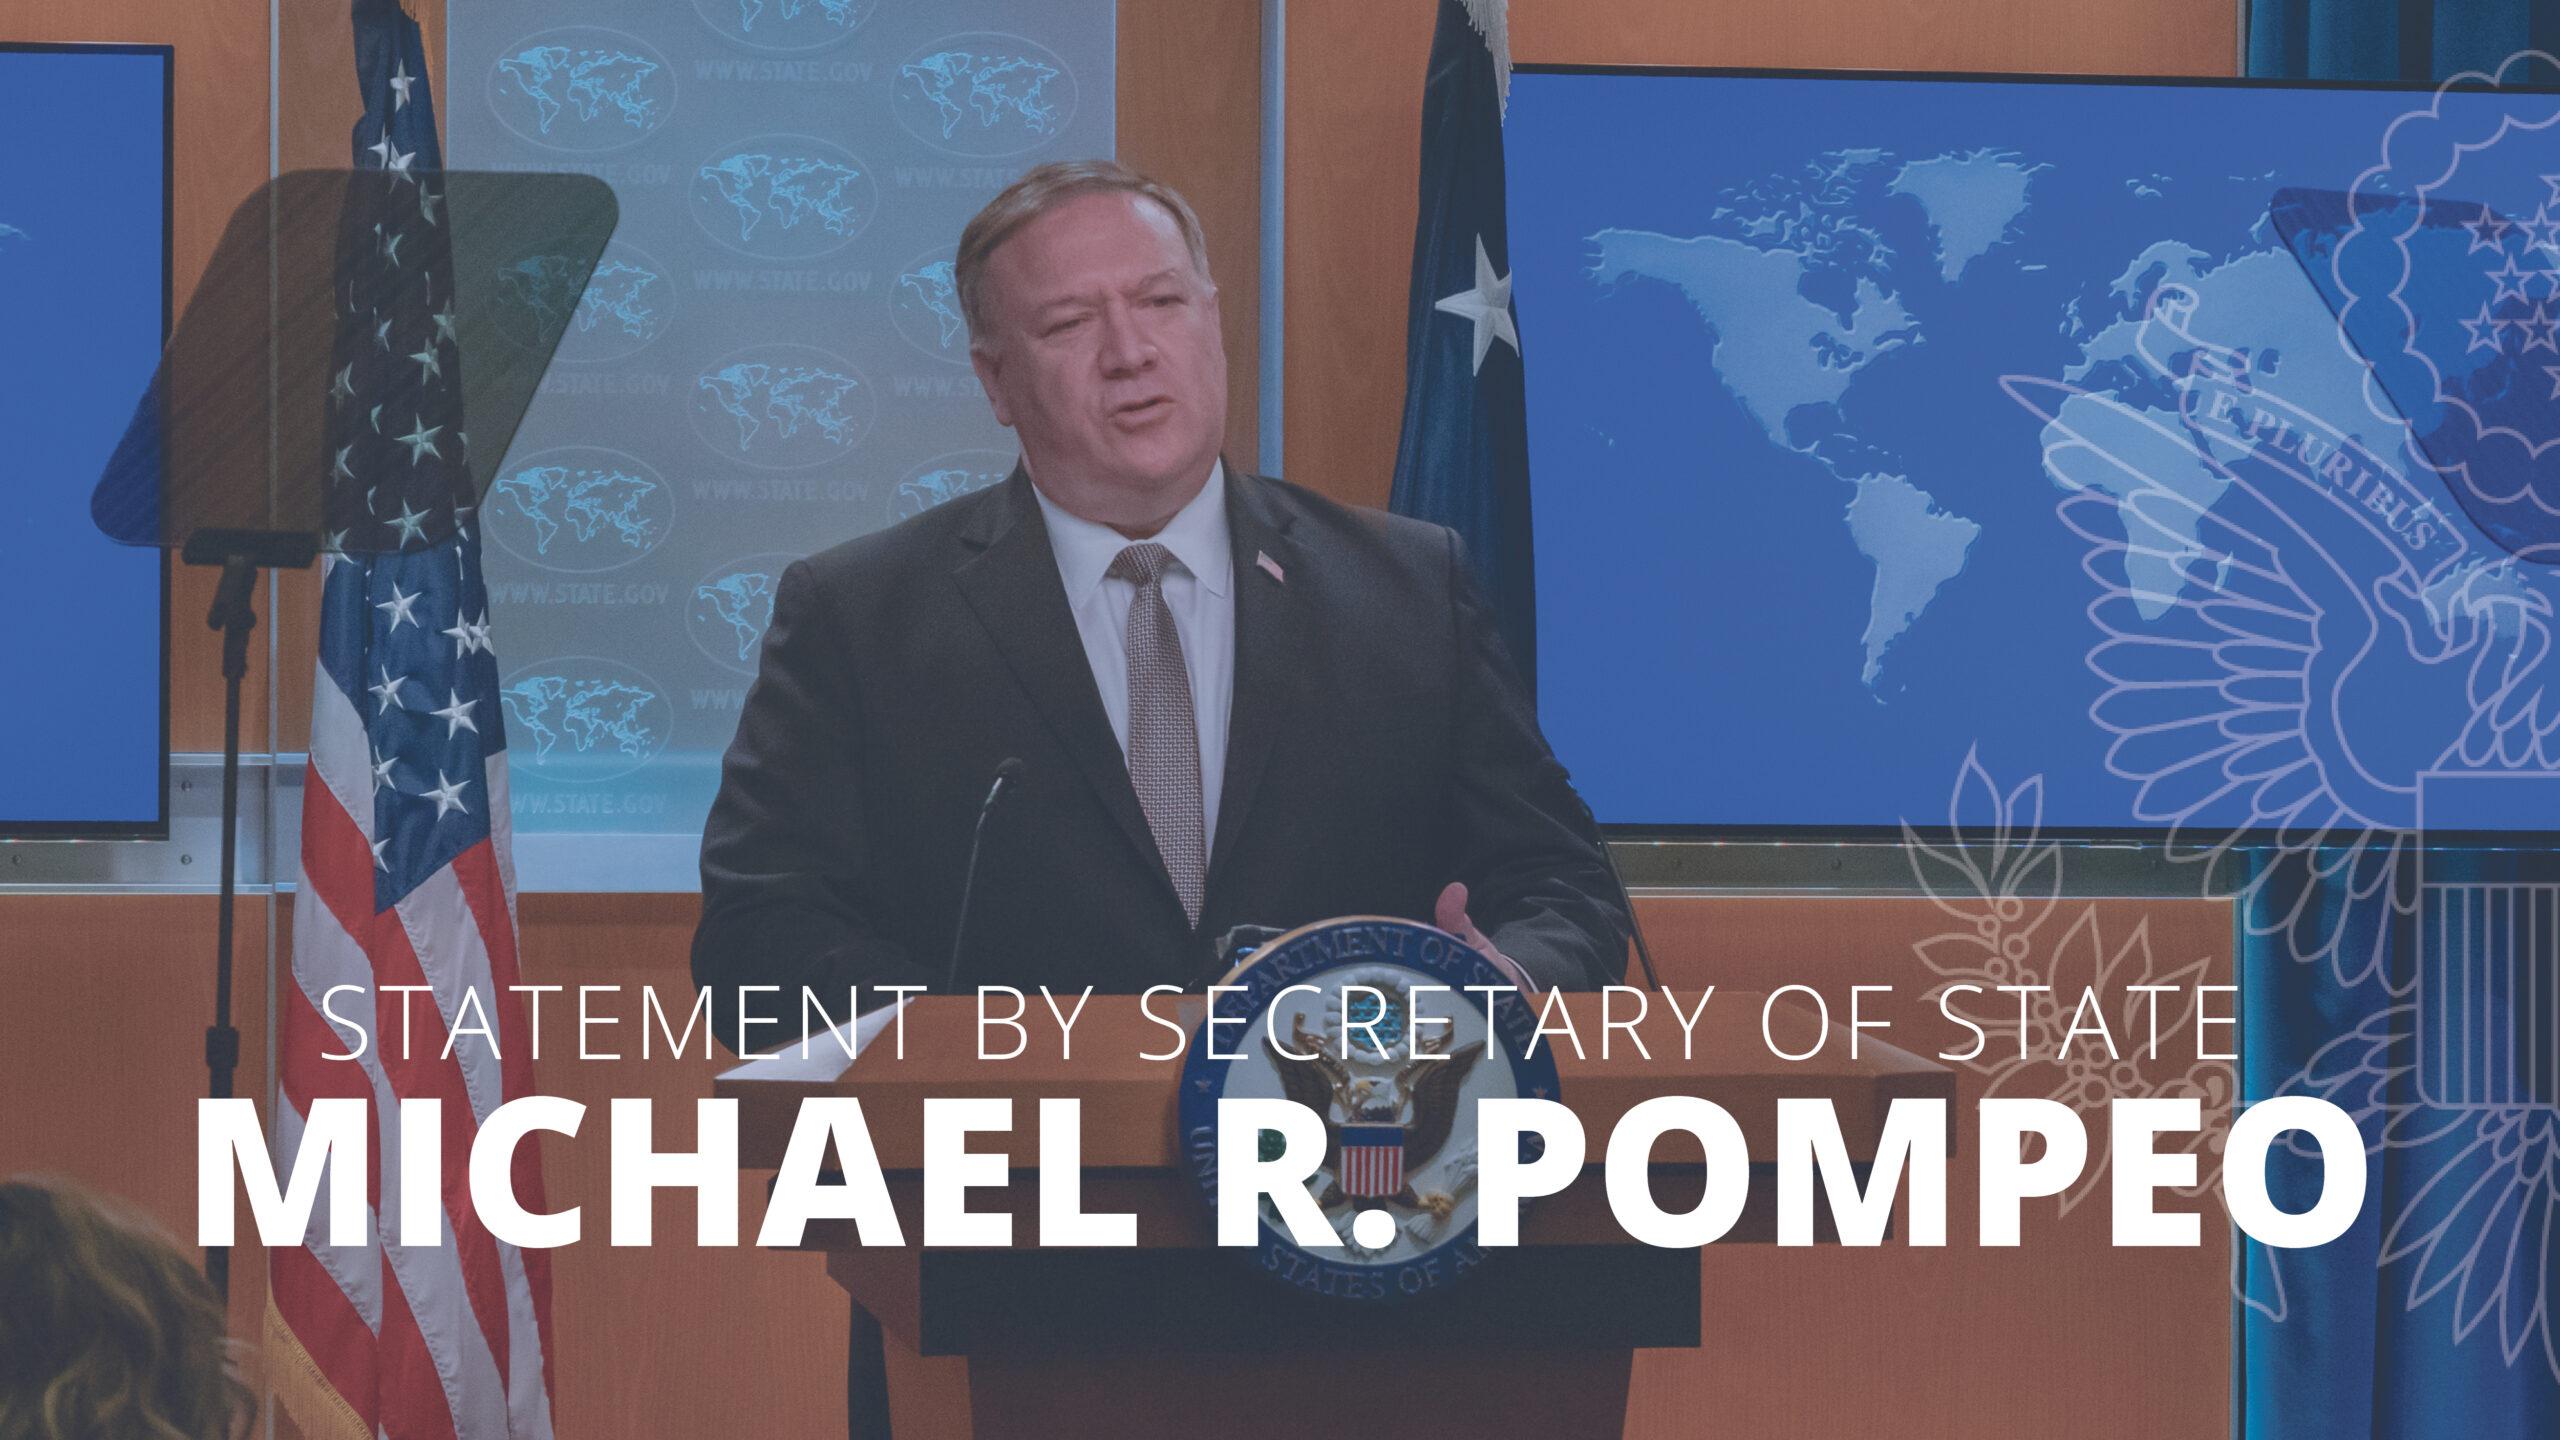 Michael R. Pompeo